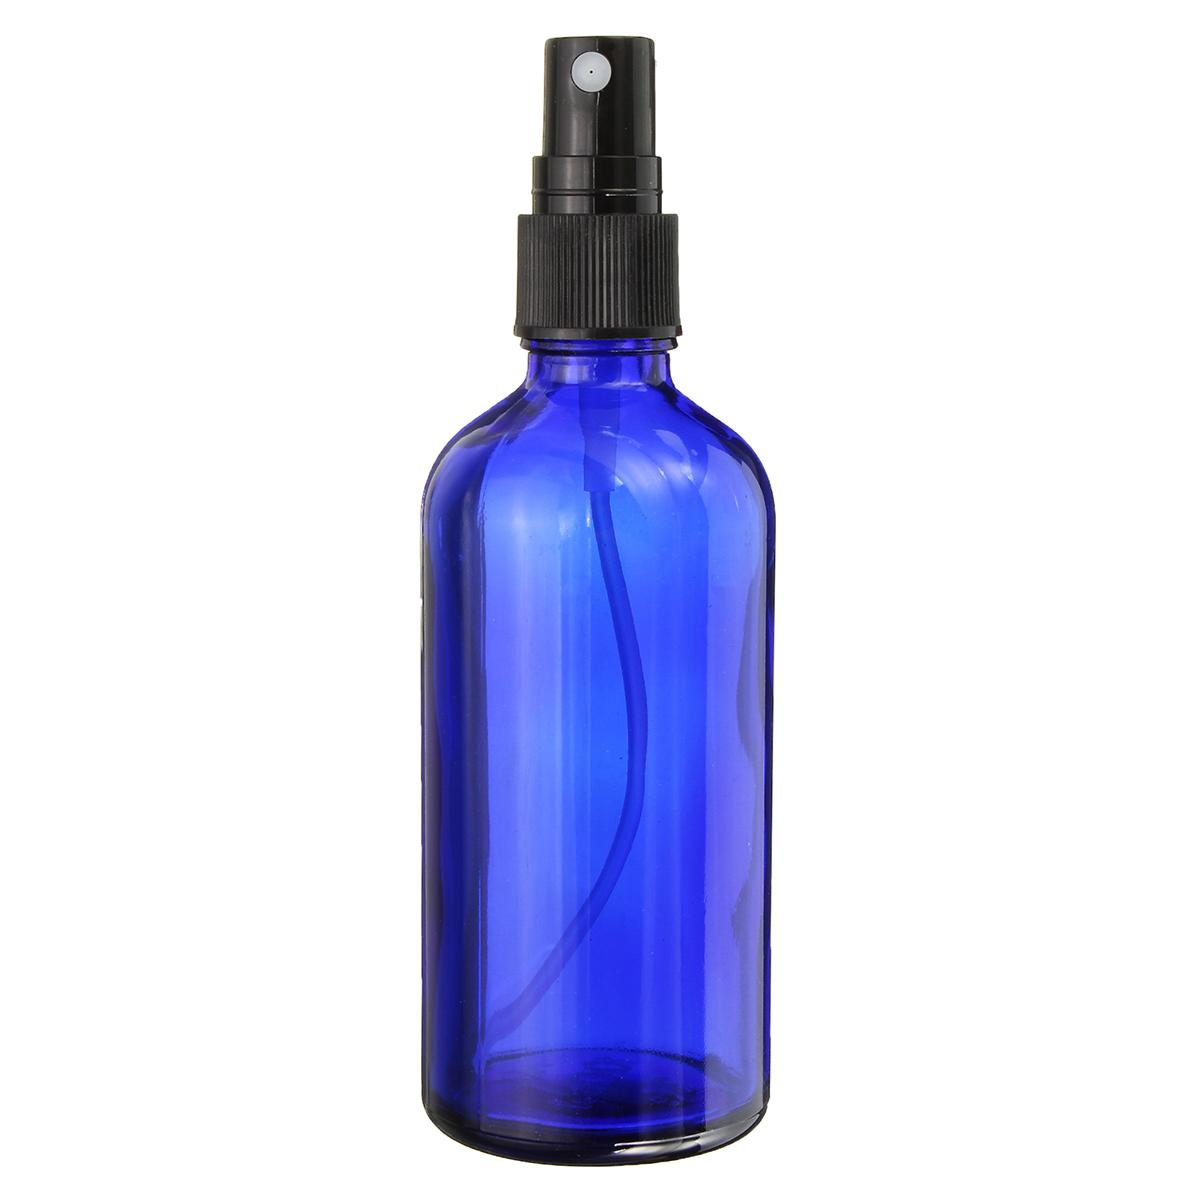 35pcs100ml Blue Empty Perfume Spray Glass Bottle Essential Oil Liquid Sprayer Travel Dispenser Fine Mist Atomizer Cosmetic Container